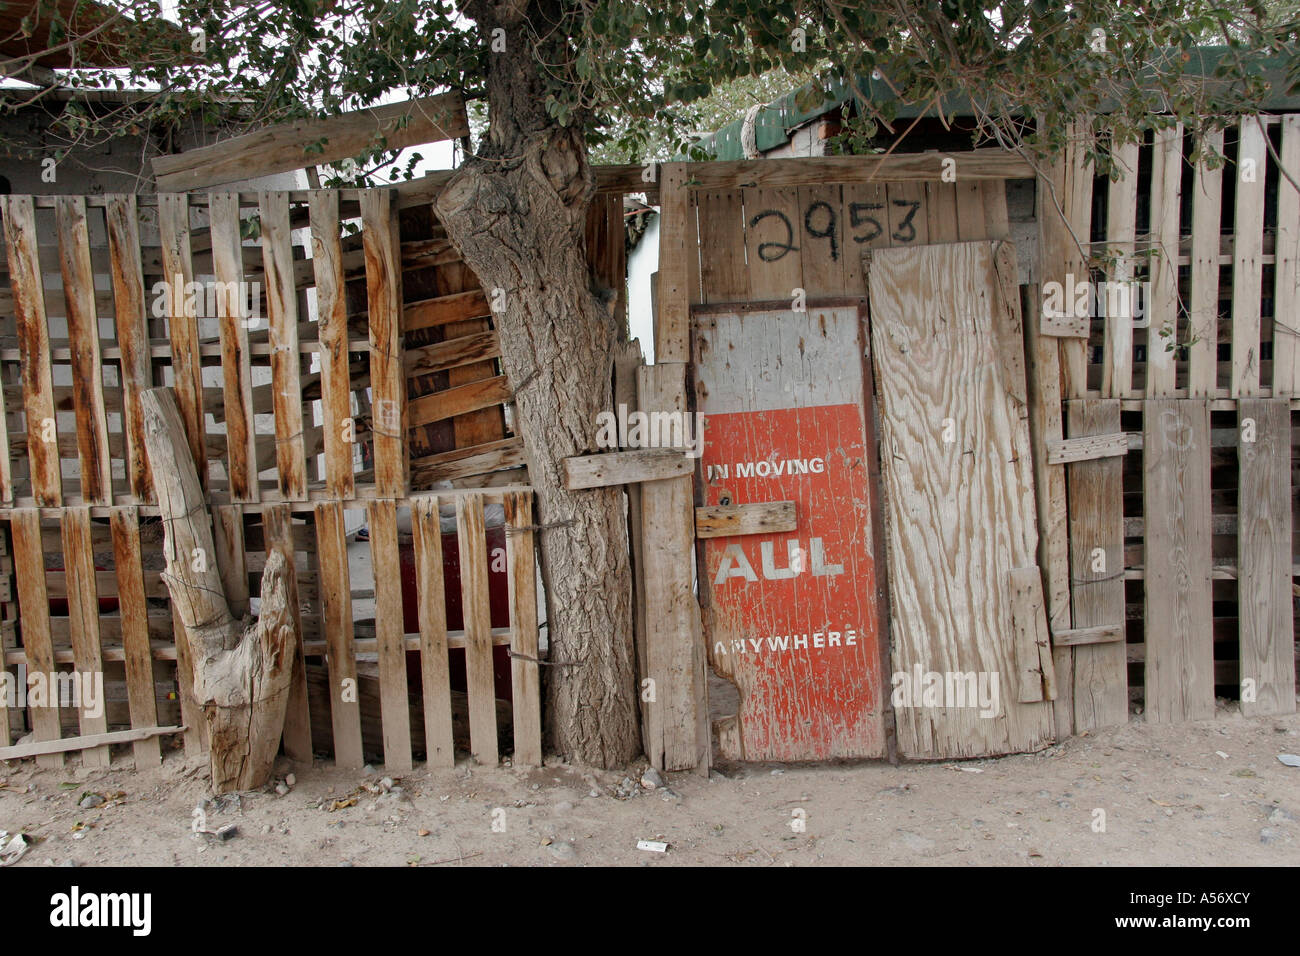 Painet ja1044 mexico hispanic fence made old pallets scrap juarez chihuahua photo 2005 latin america borders 20031001 - Stock Image